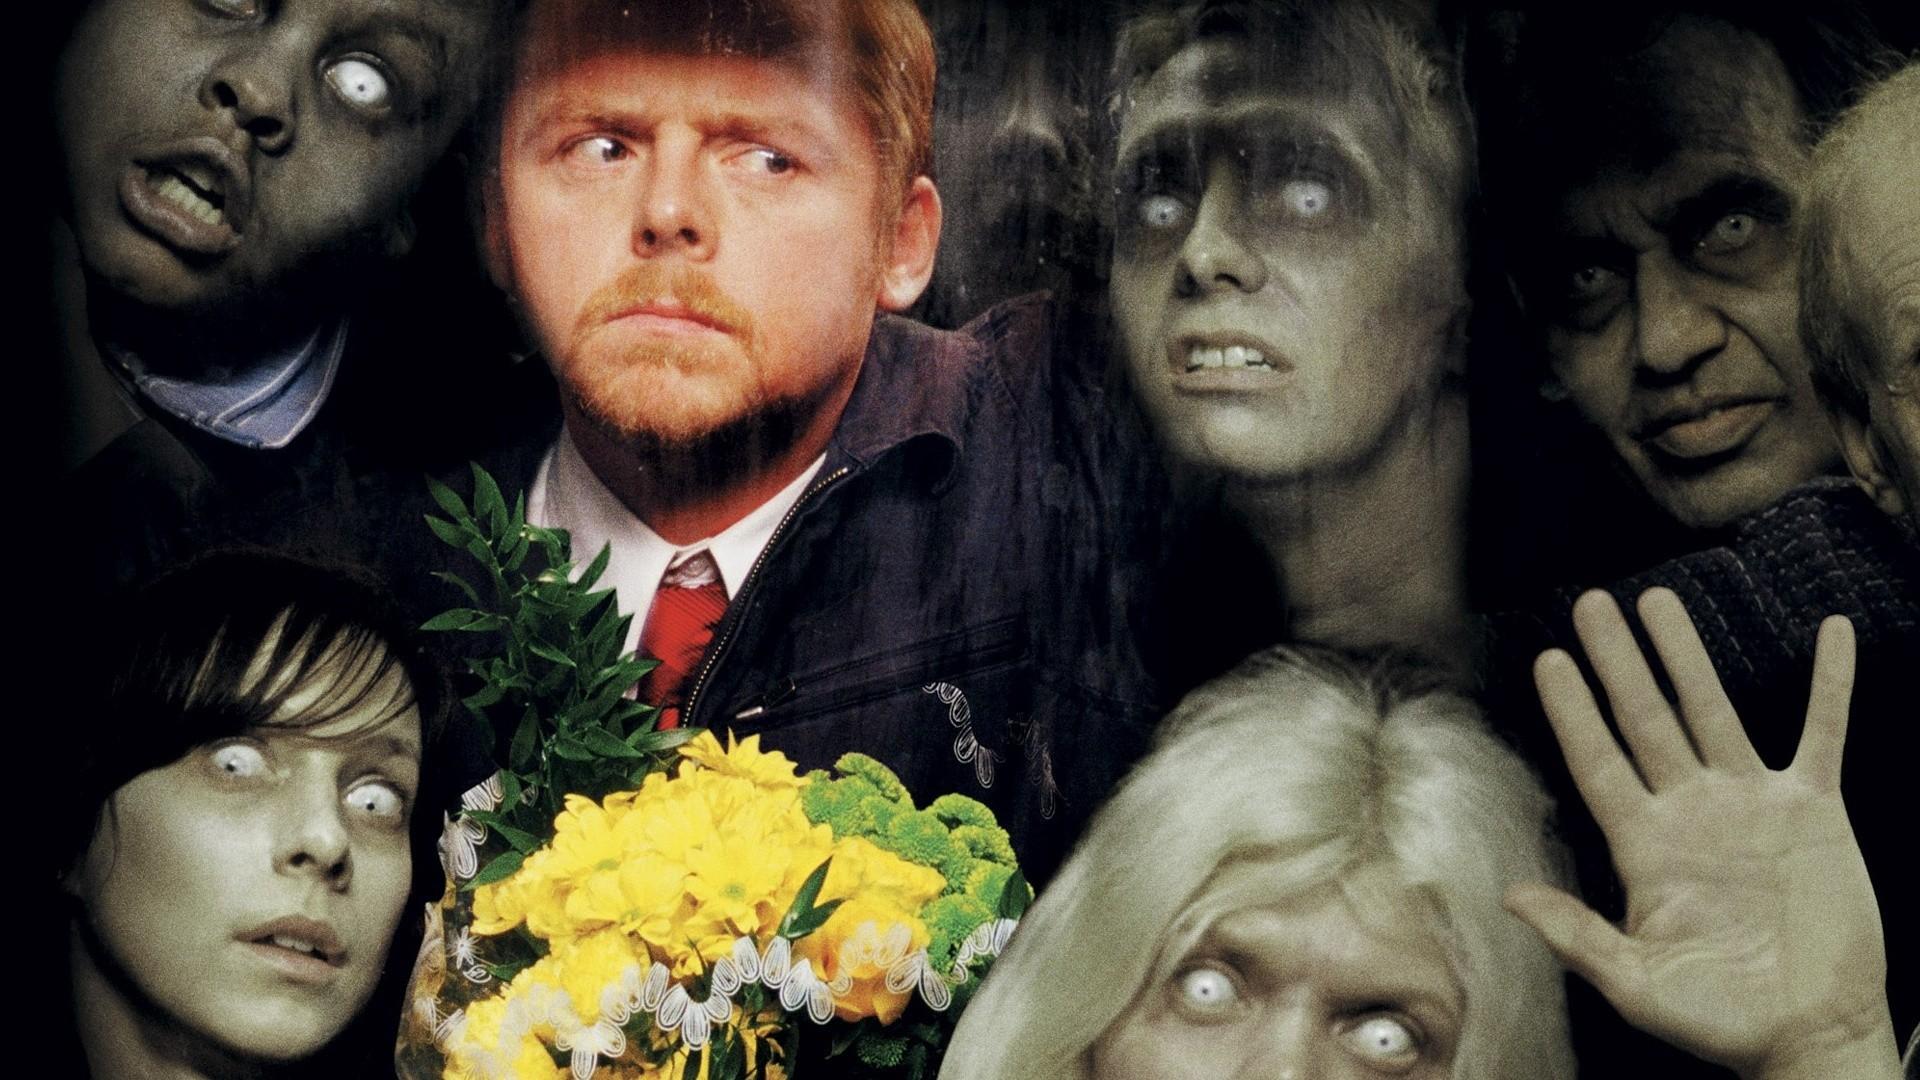 shaun of the dead dark horror zombie f wallpaper